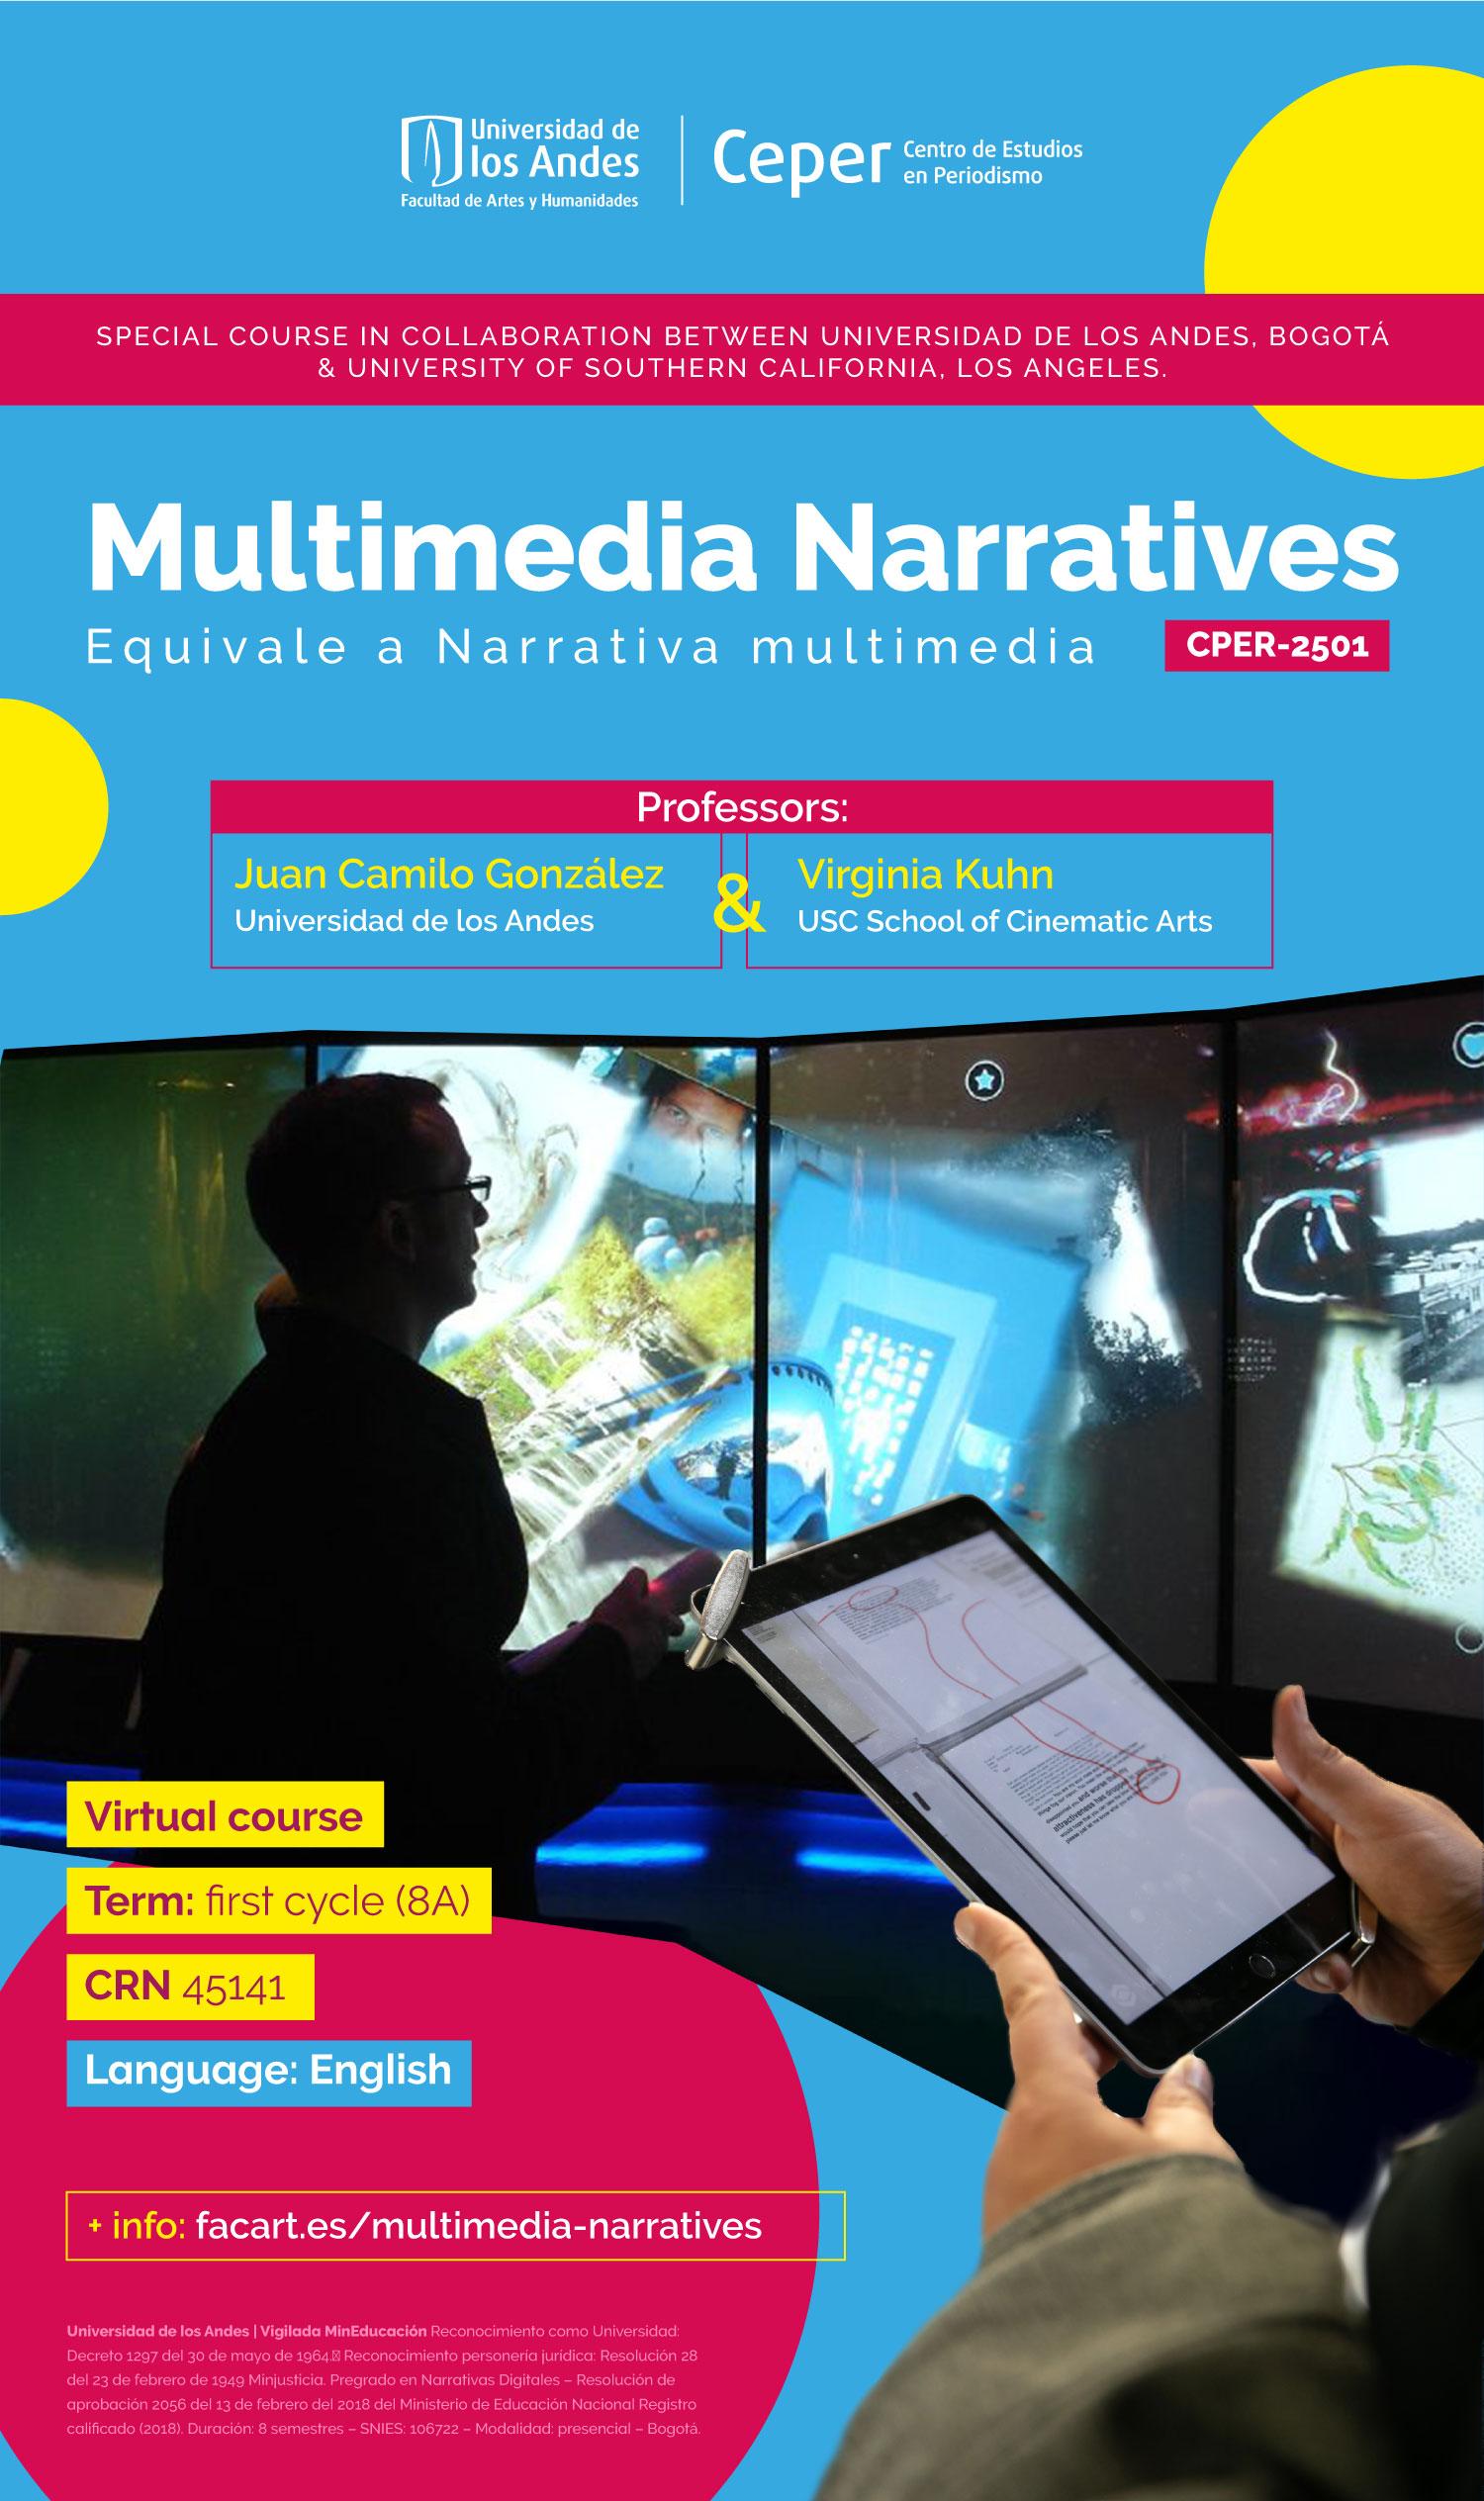 Multimedia Narratives